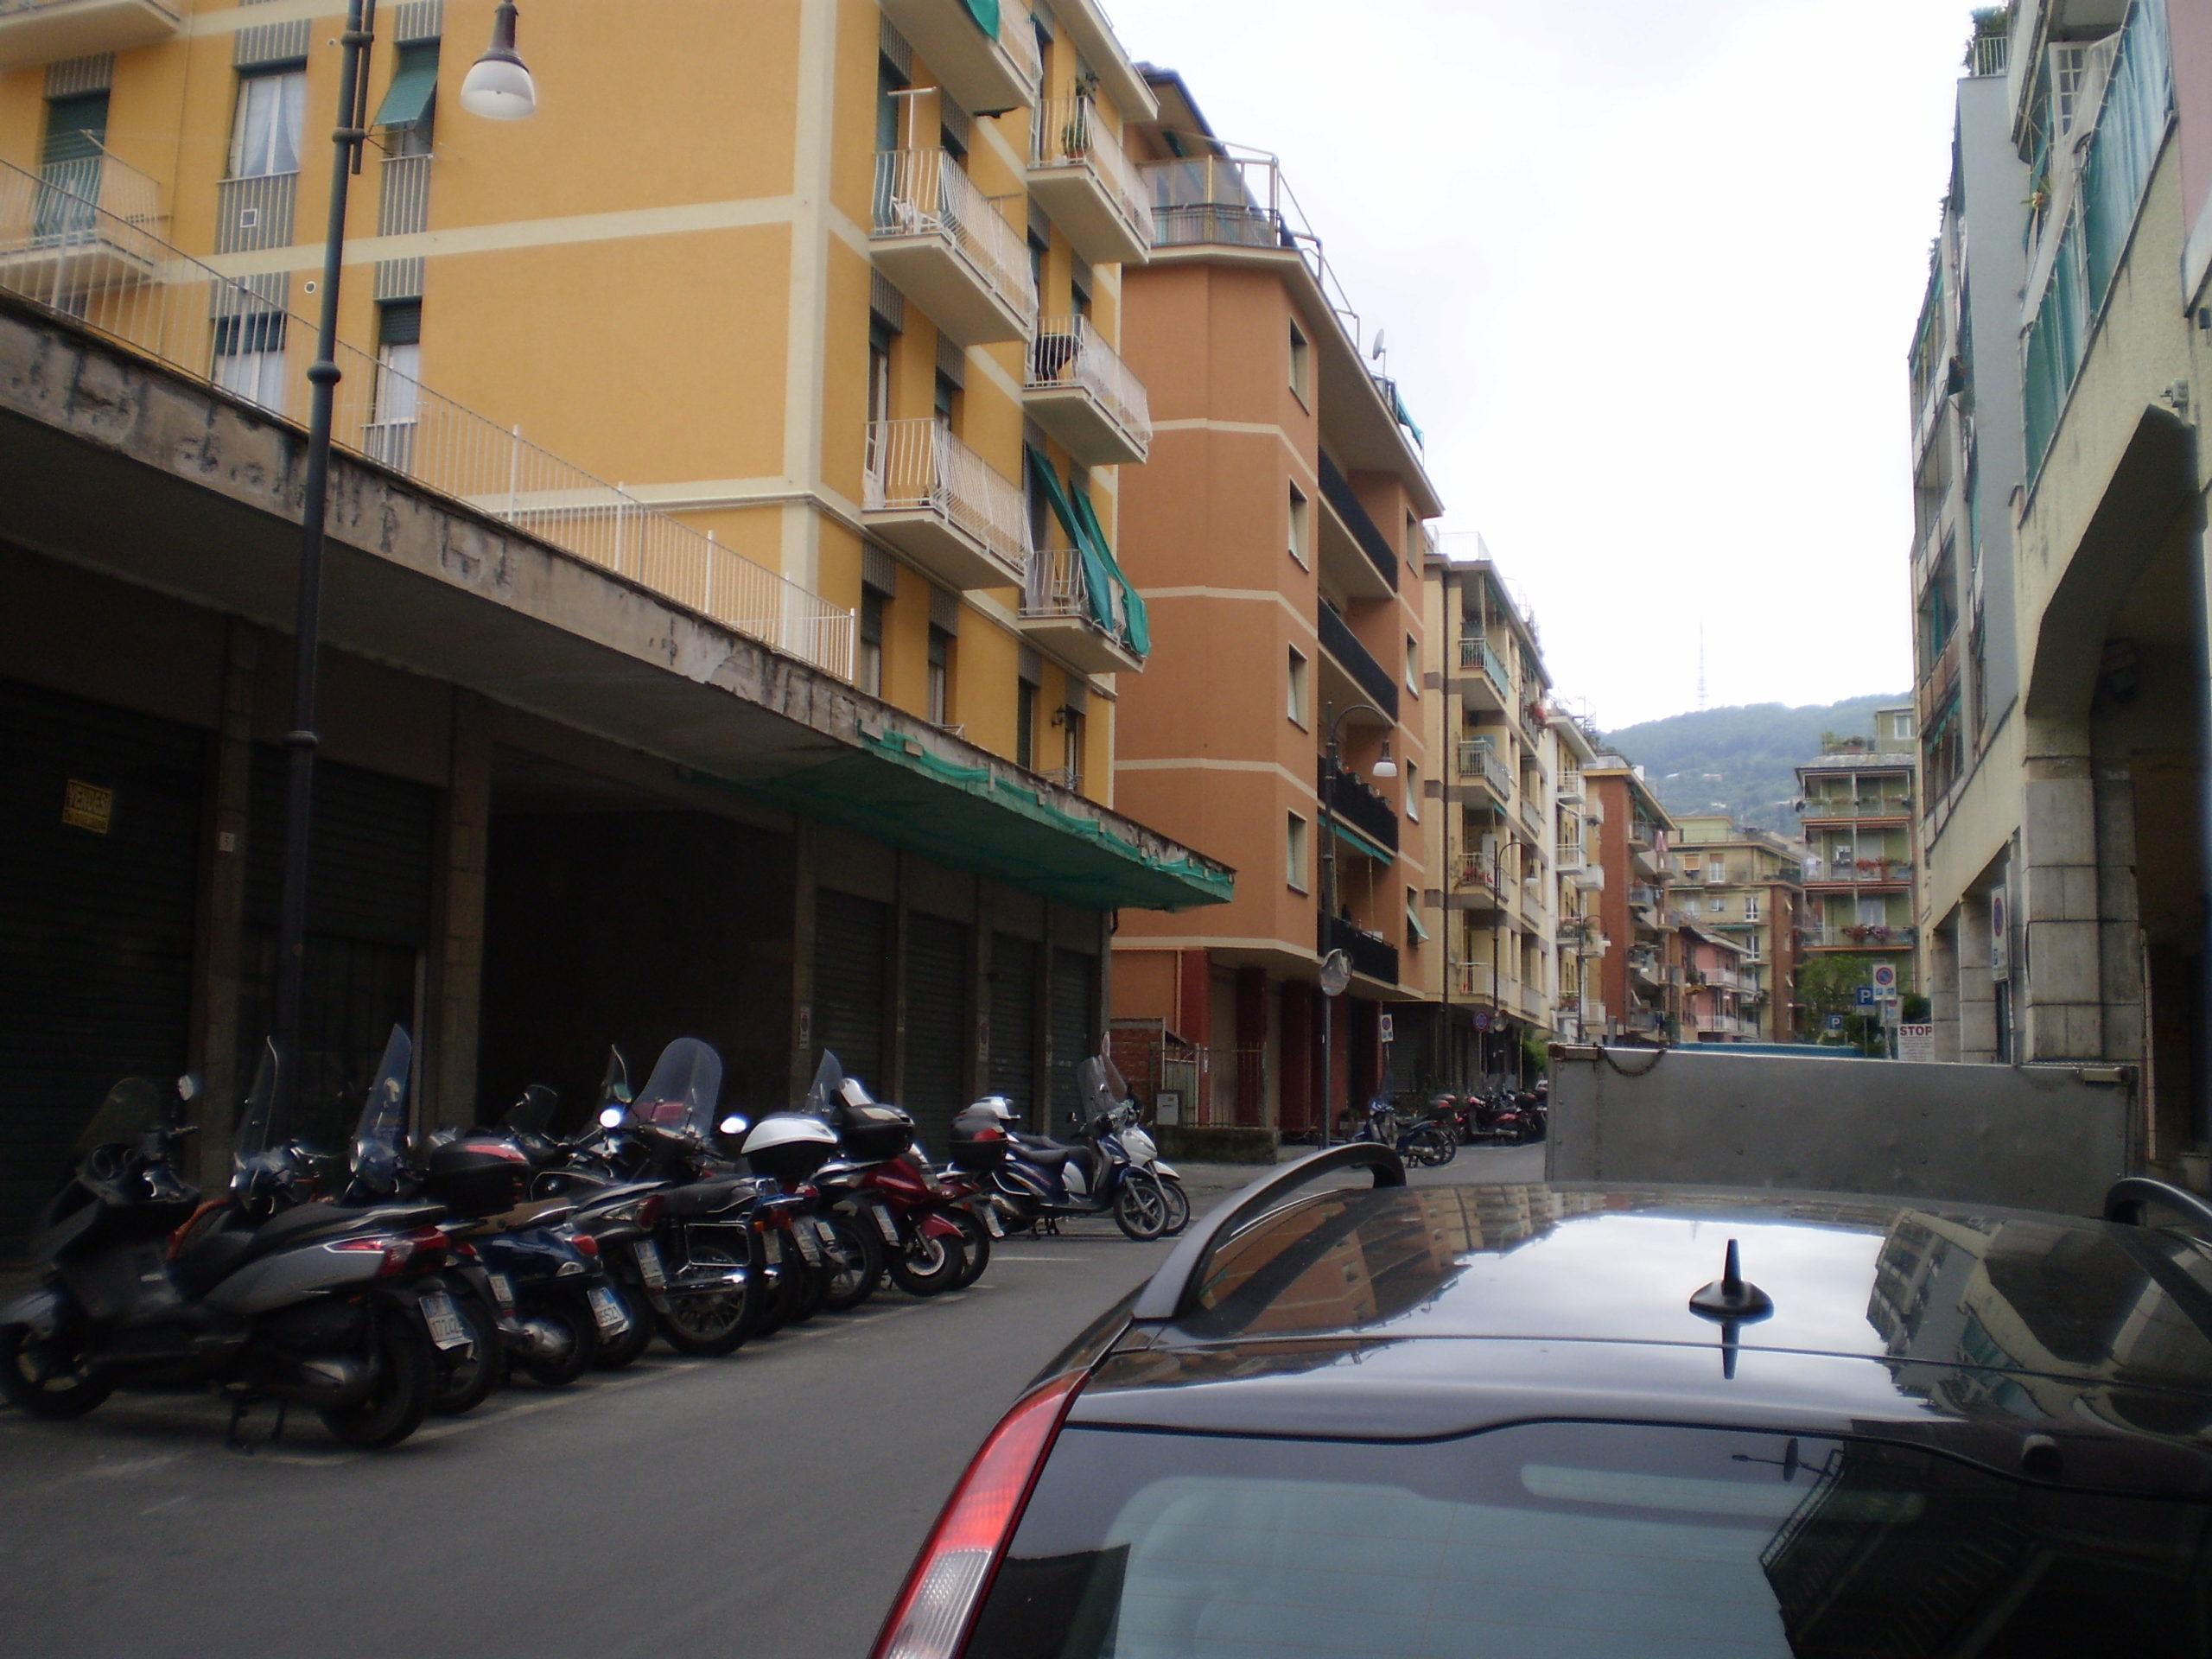 Vendita Santa Margherita Ligure